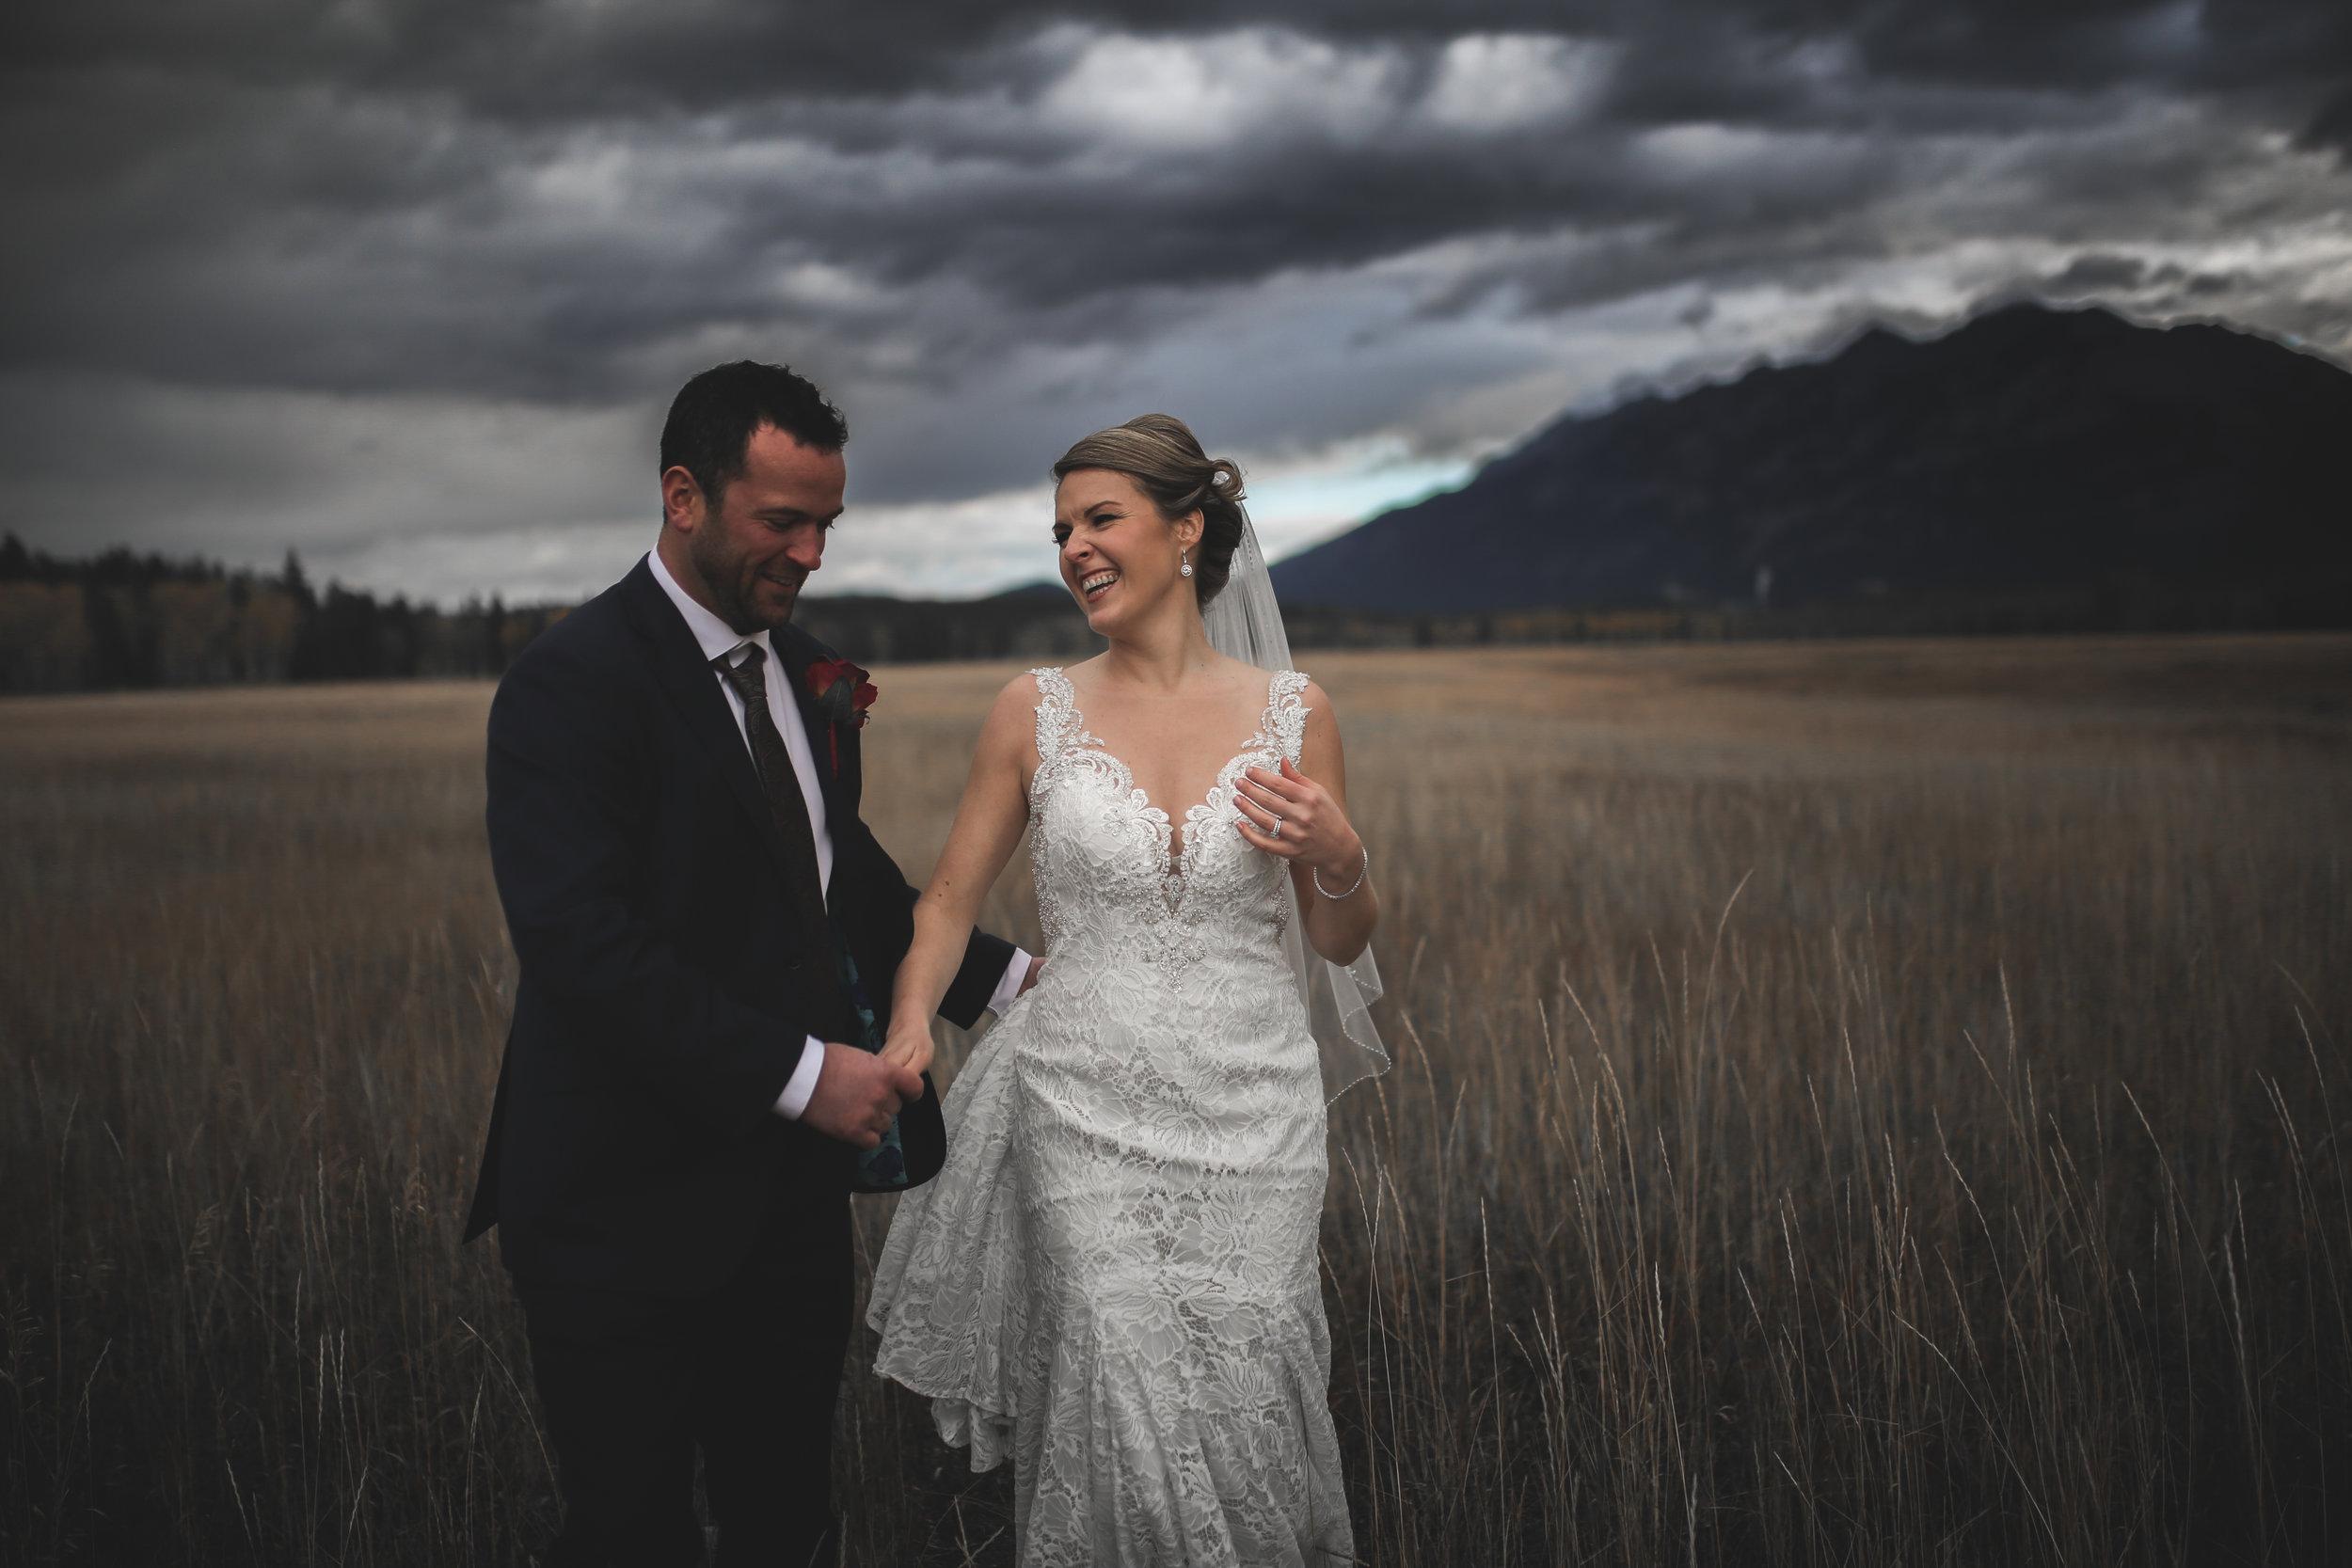 58 Adam Ziorio Photography - Vitoria wedding photographer Nick&Bree Fernie Wedding.jpg